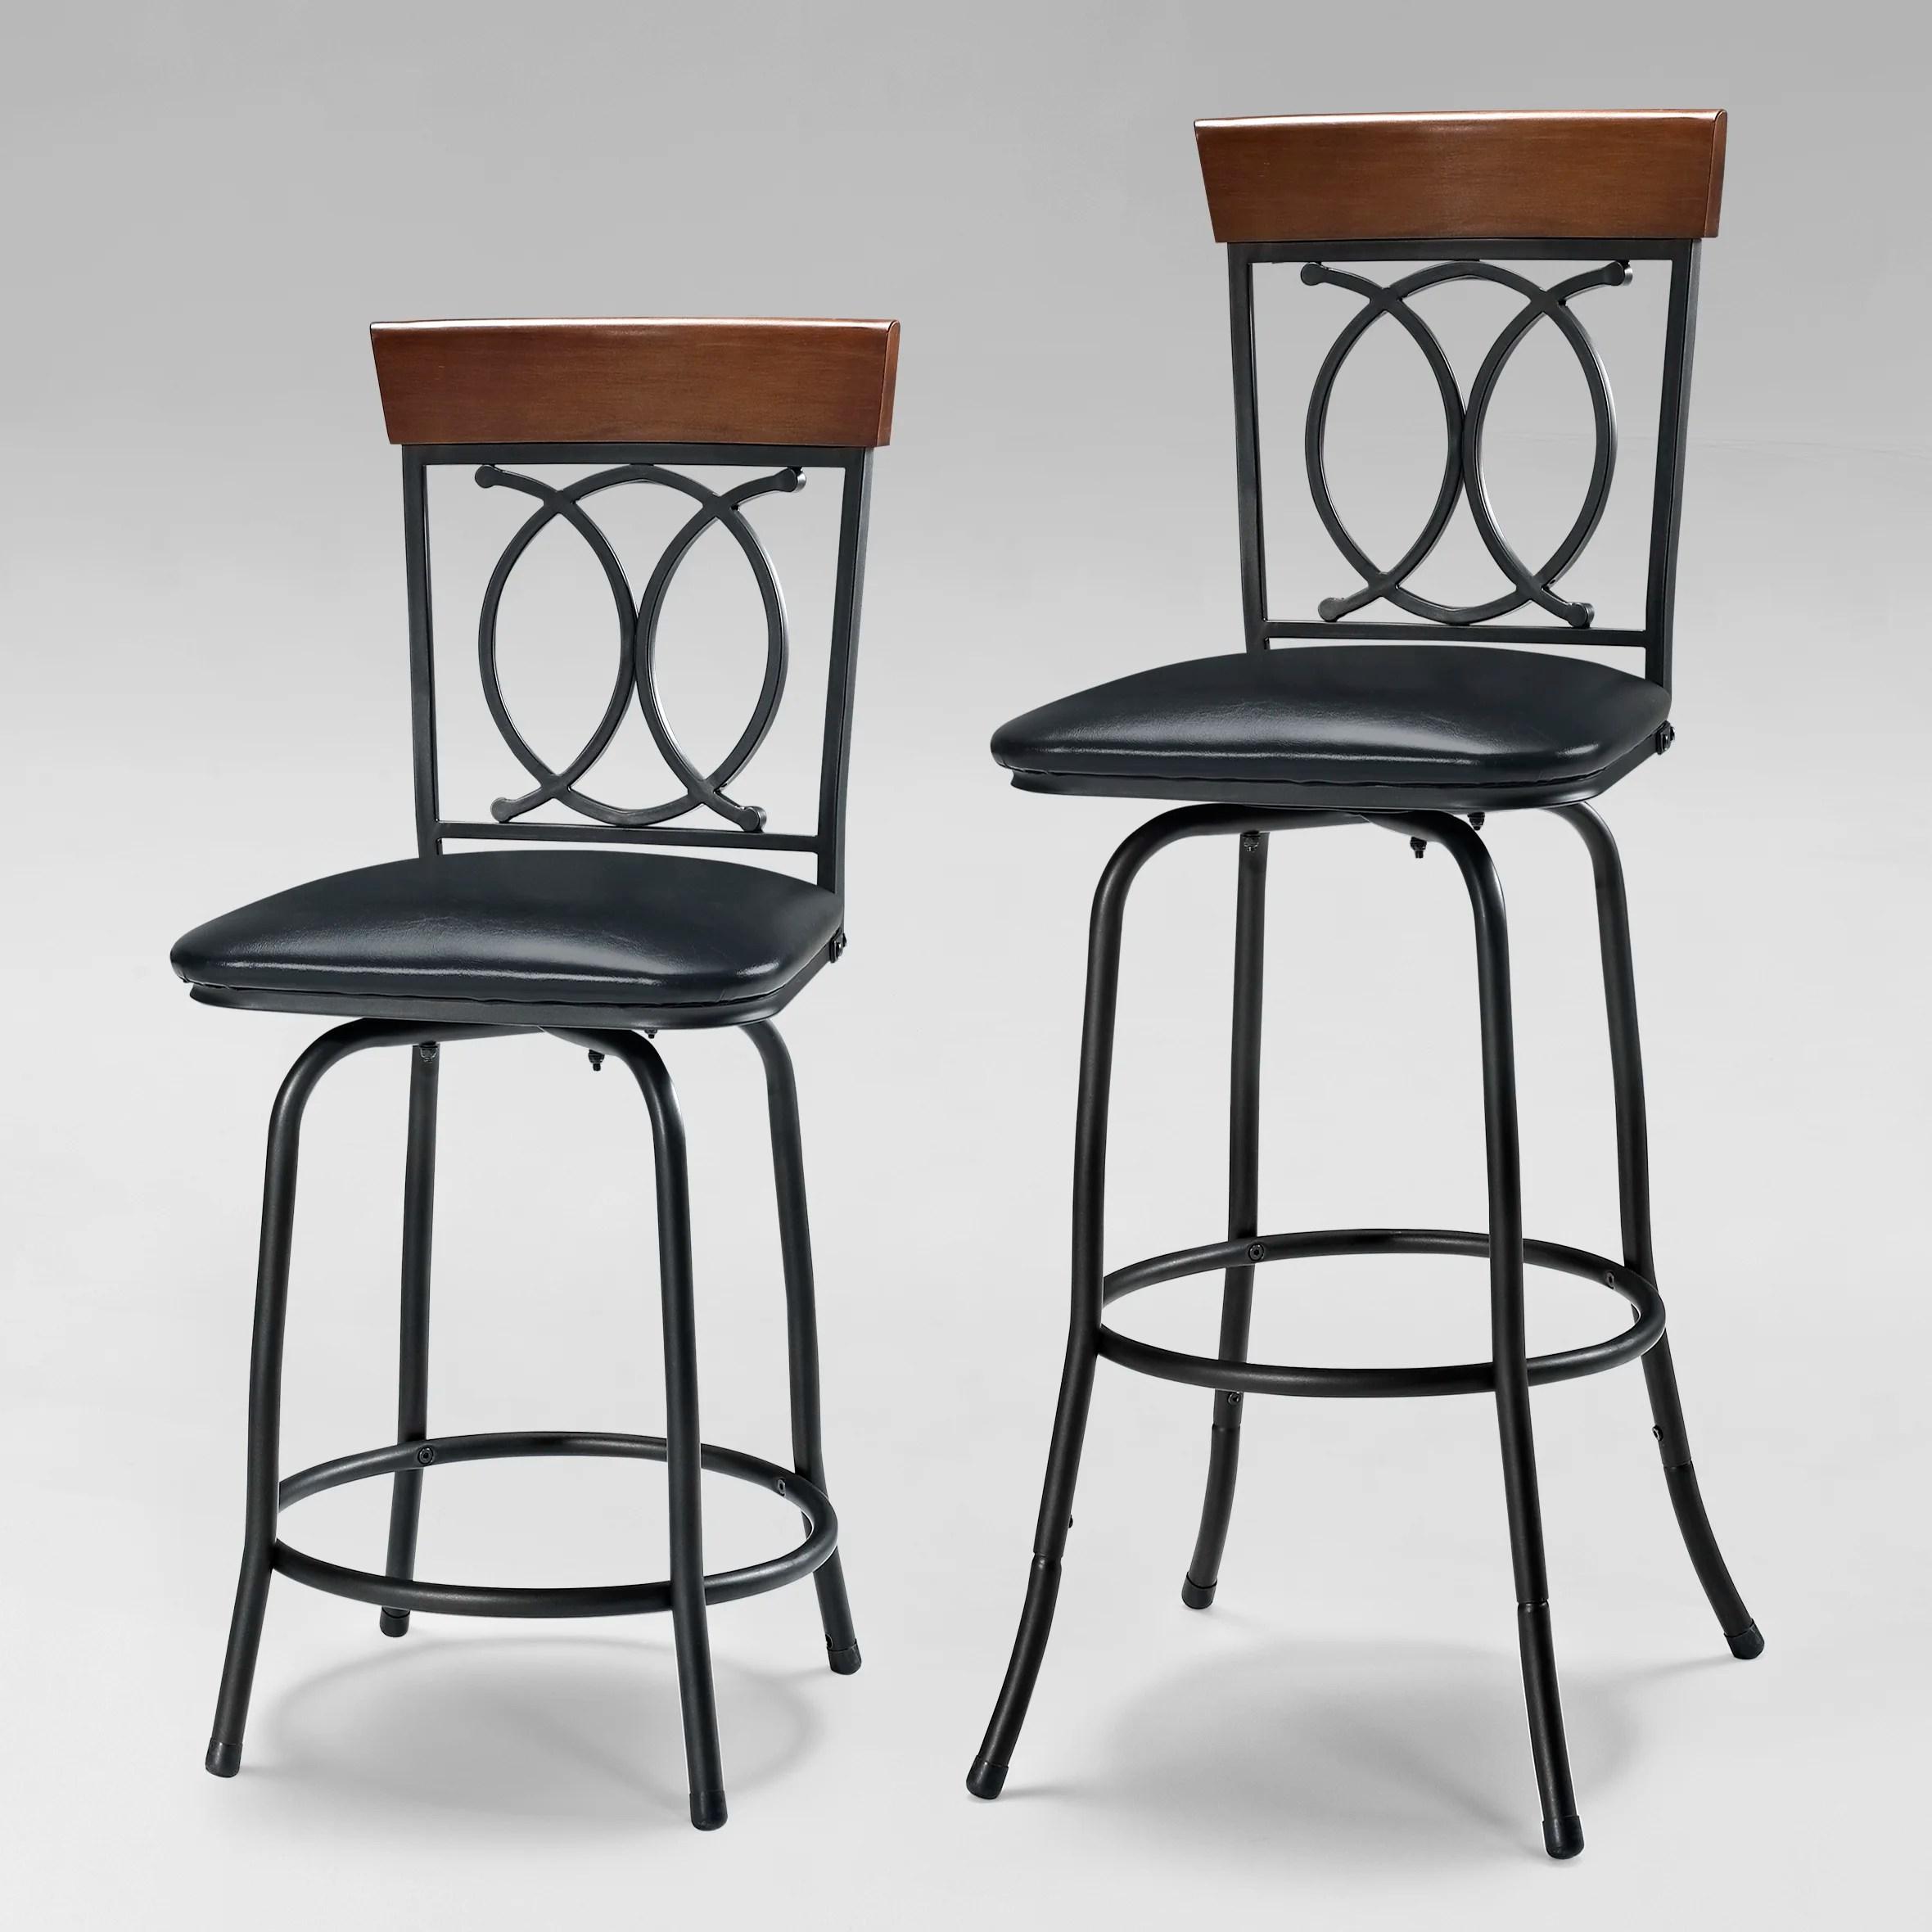 Linon Adjustable Height Bar Stool & Reviews